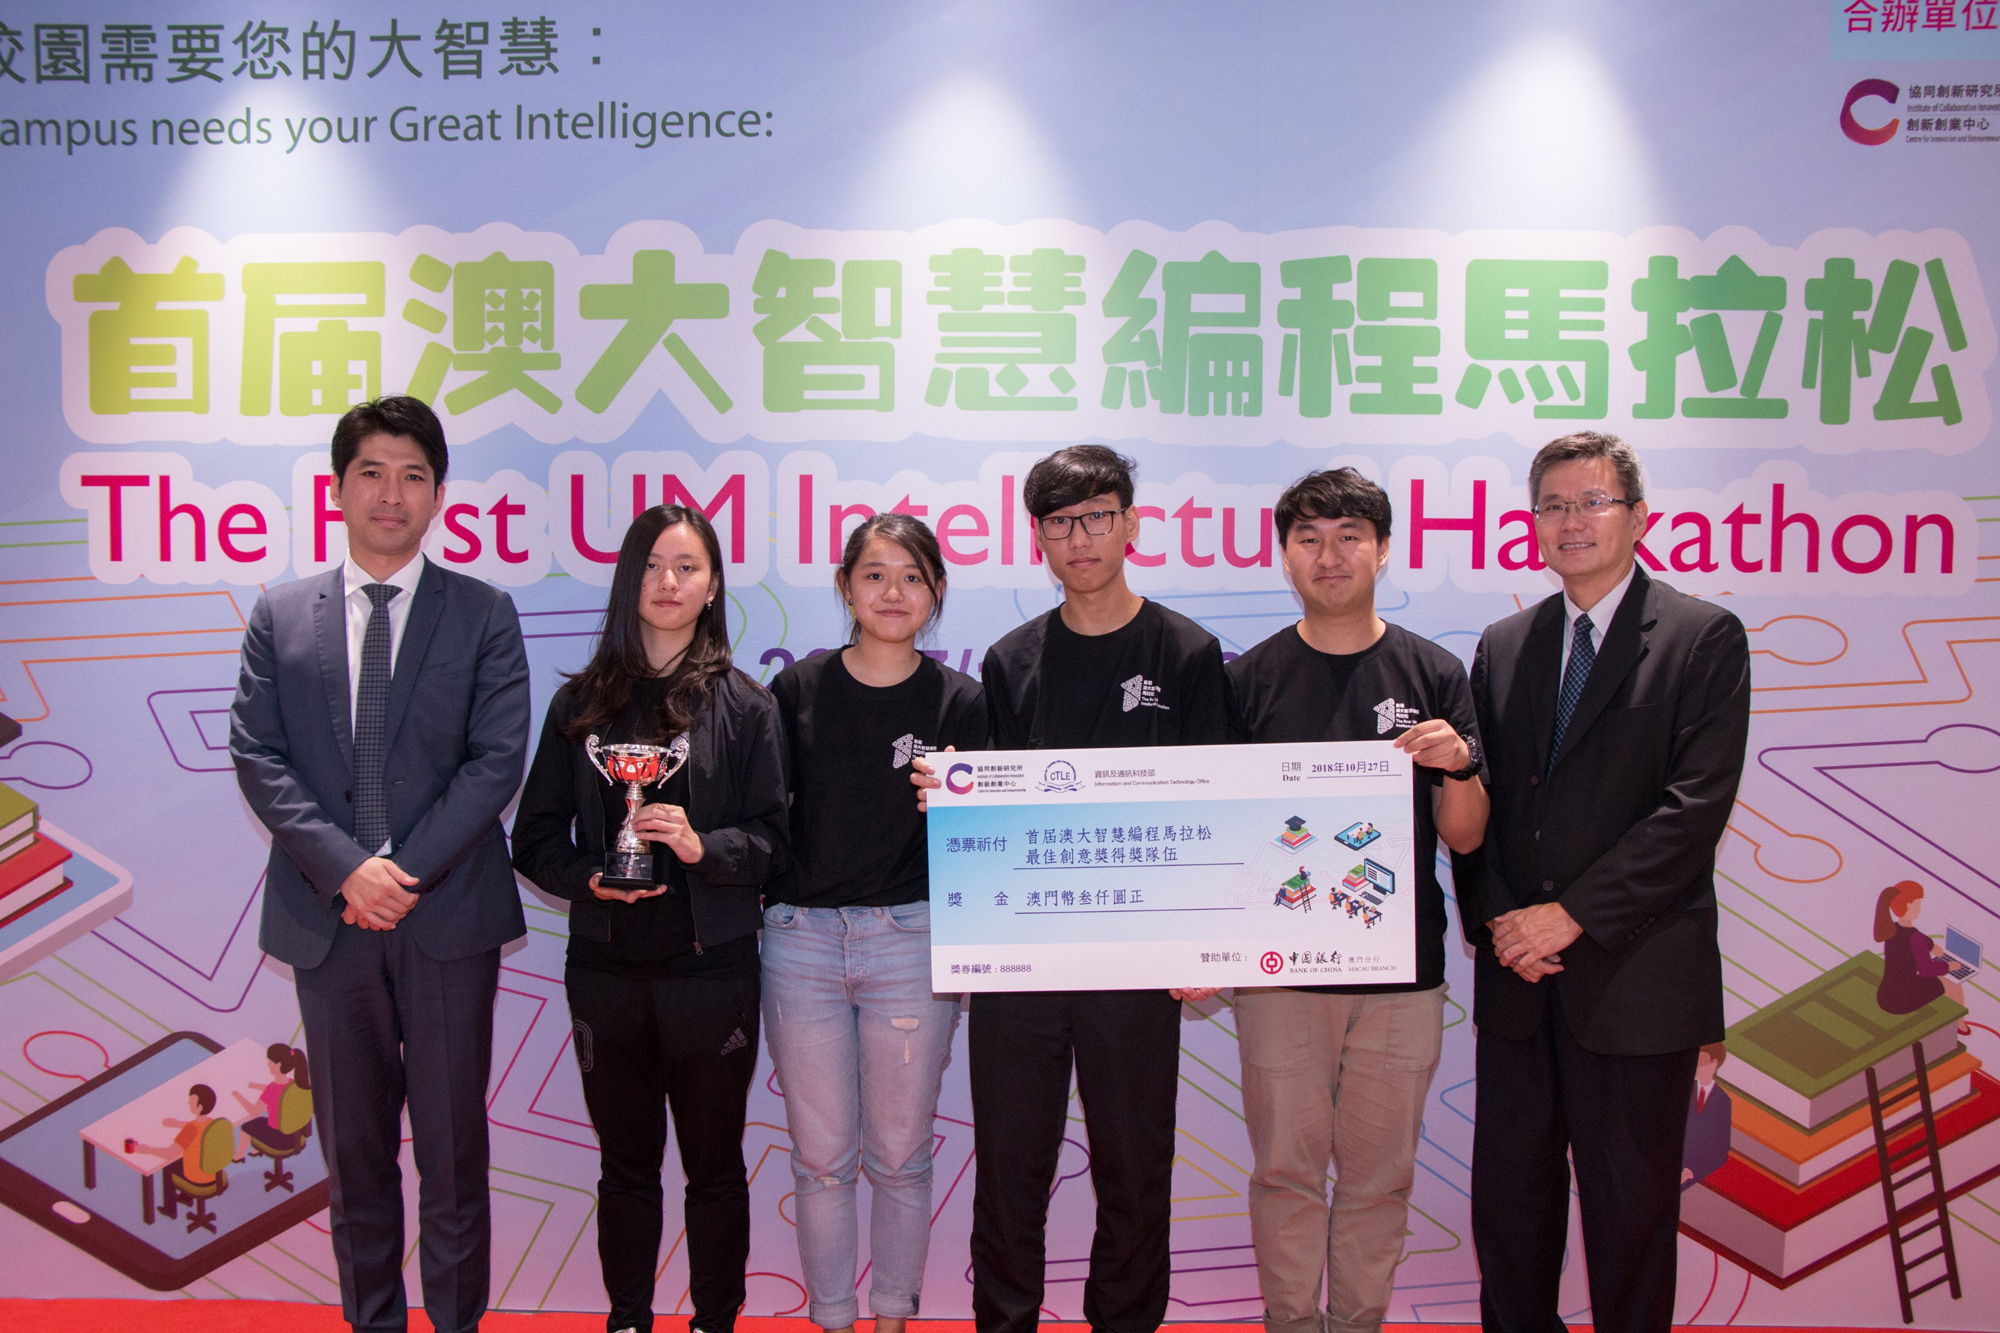 A team from UM wins an Innovative Prize